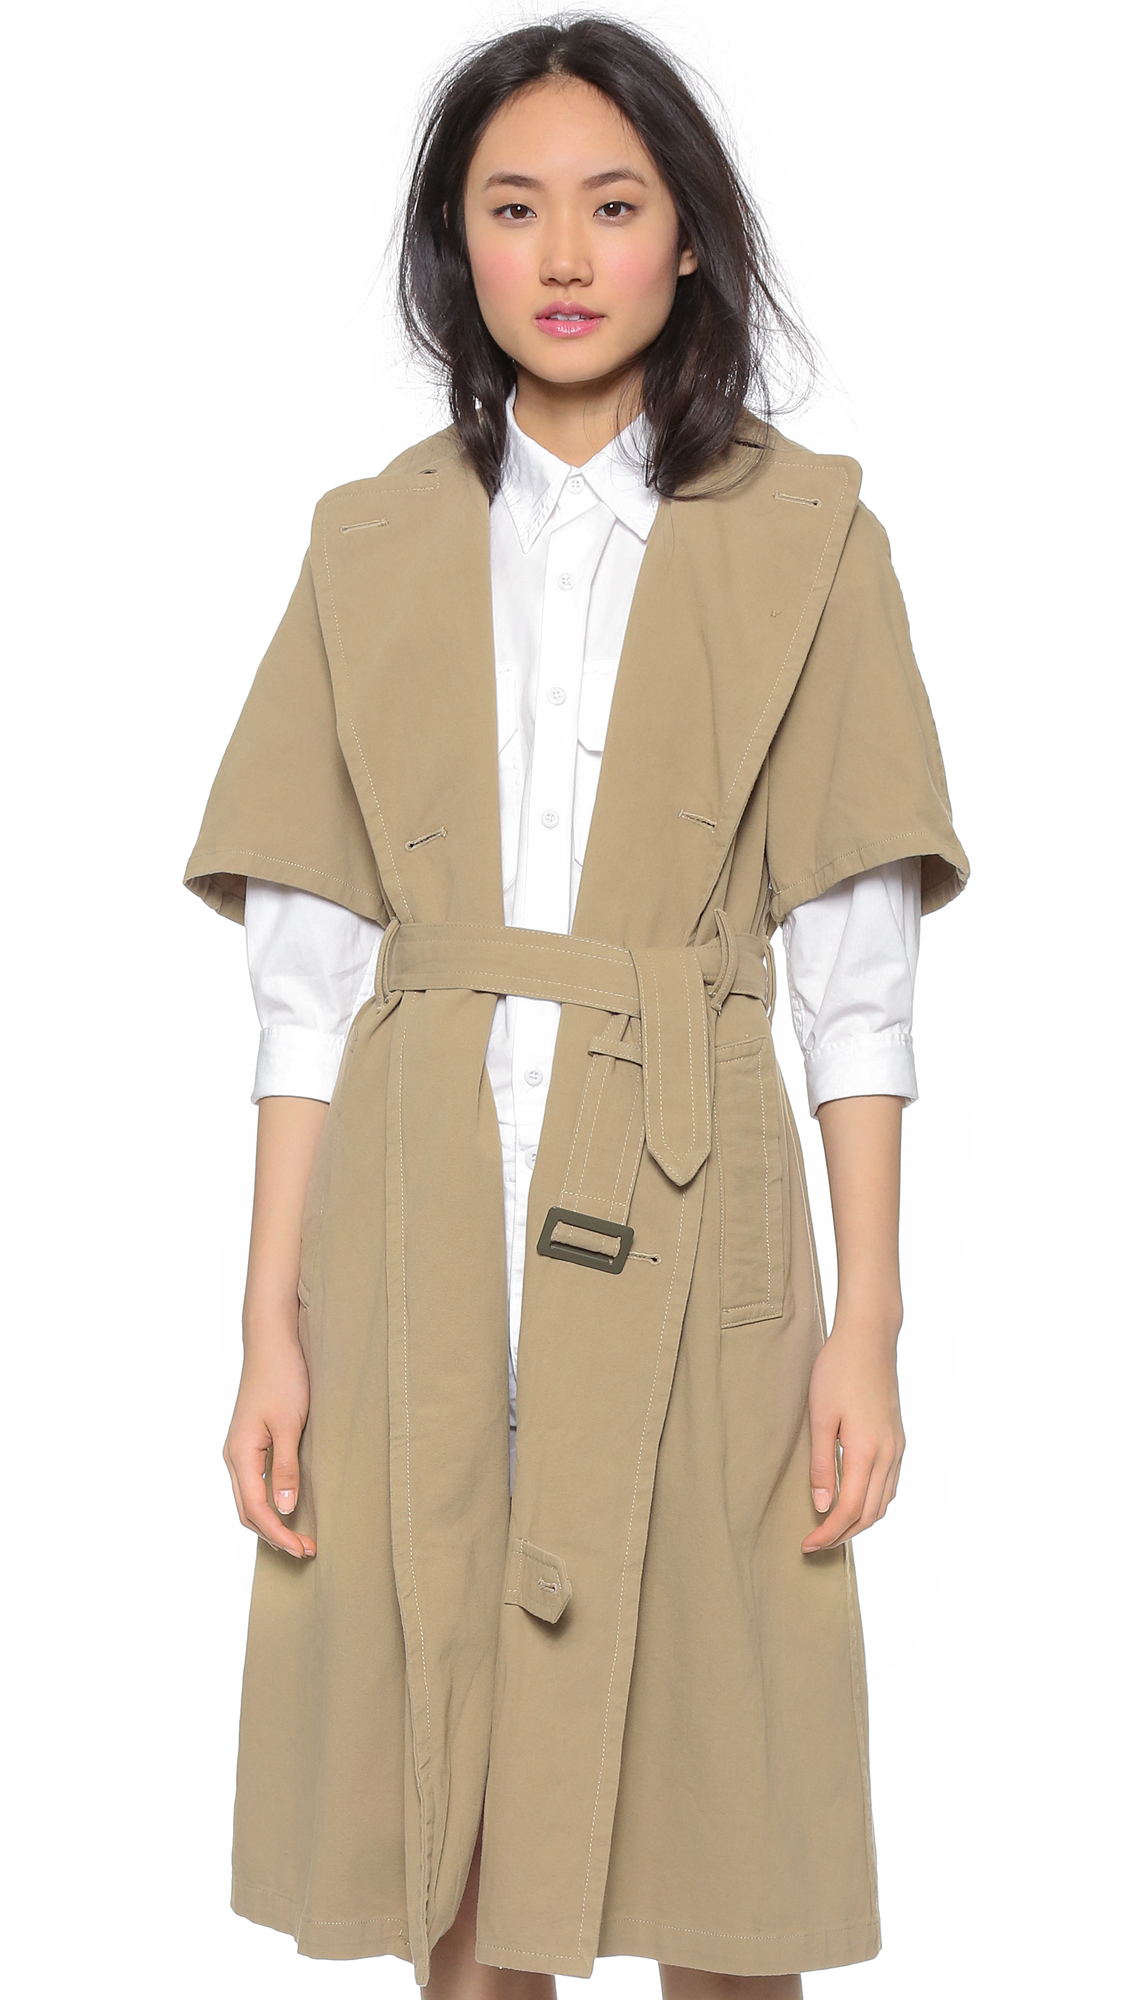 Nlst Short Sleeve Trench Coat - Khaki in Natural | Lyst